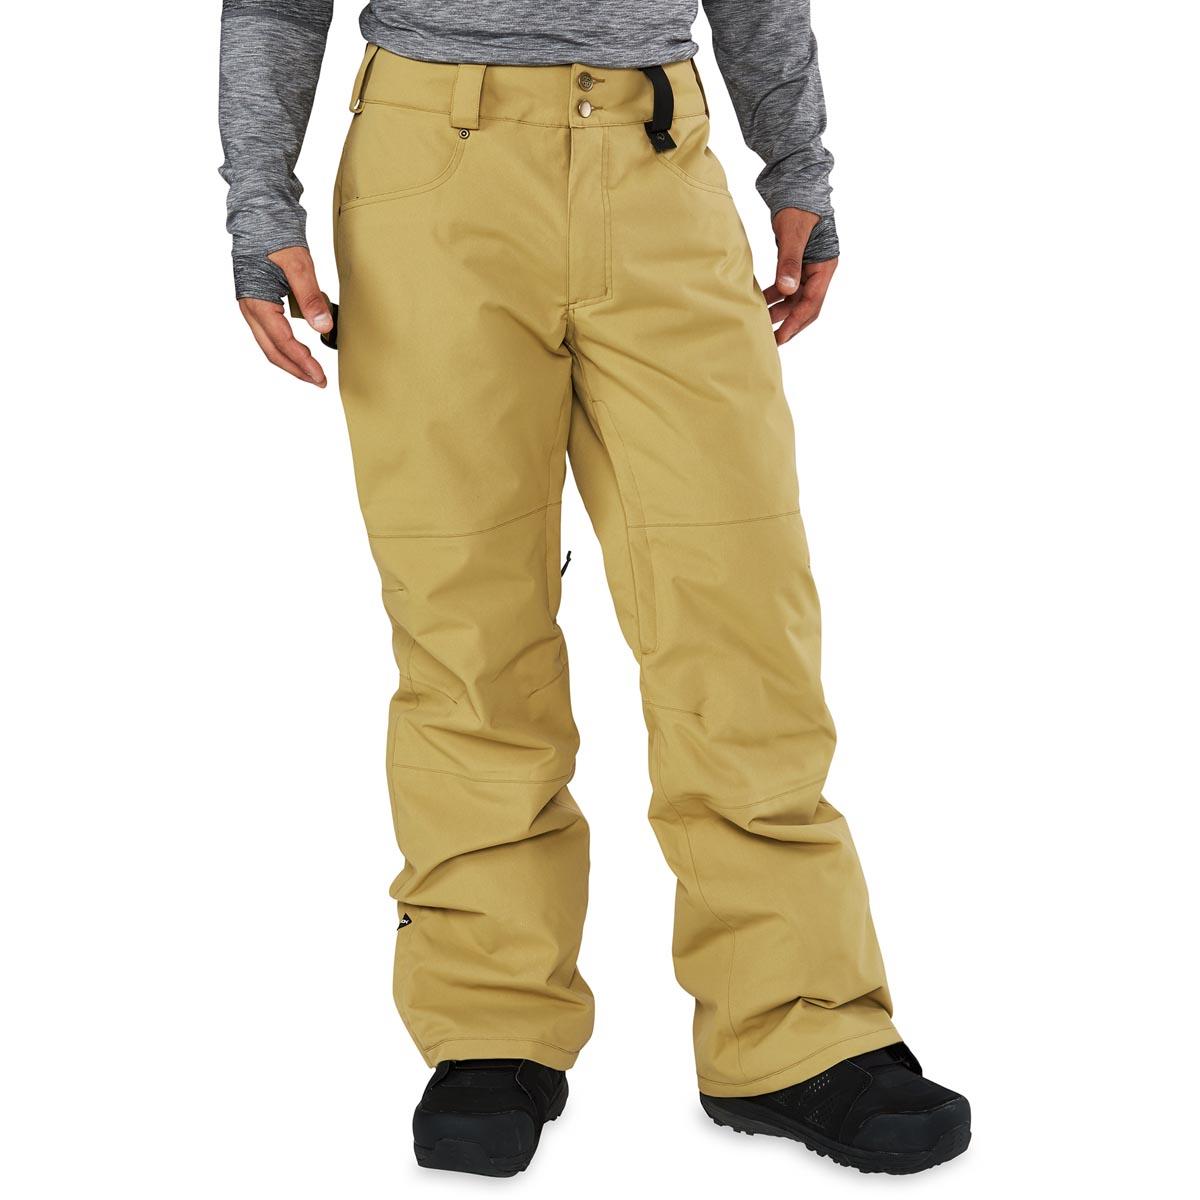 Artillery Insulated Pant Herren Ski Snowboard Hose Black